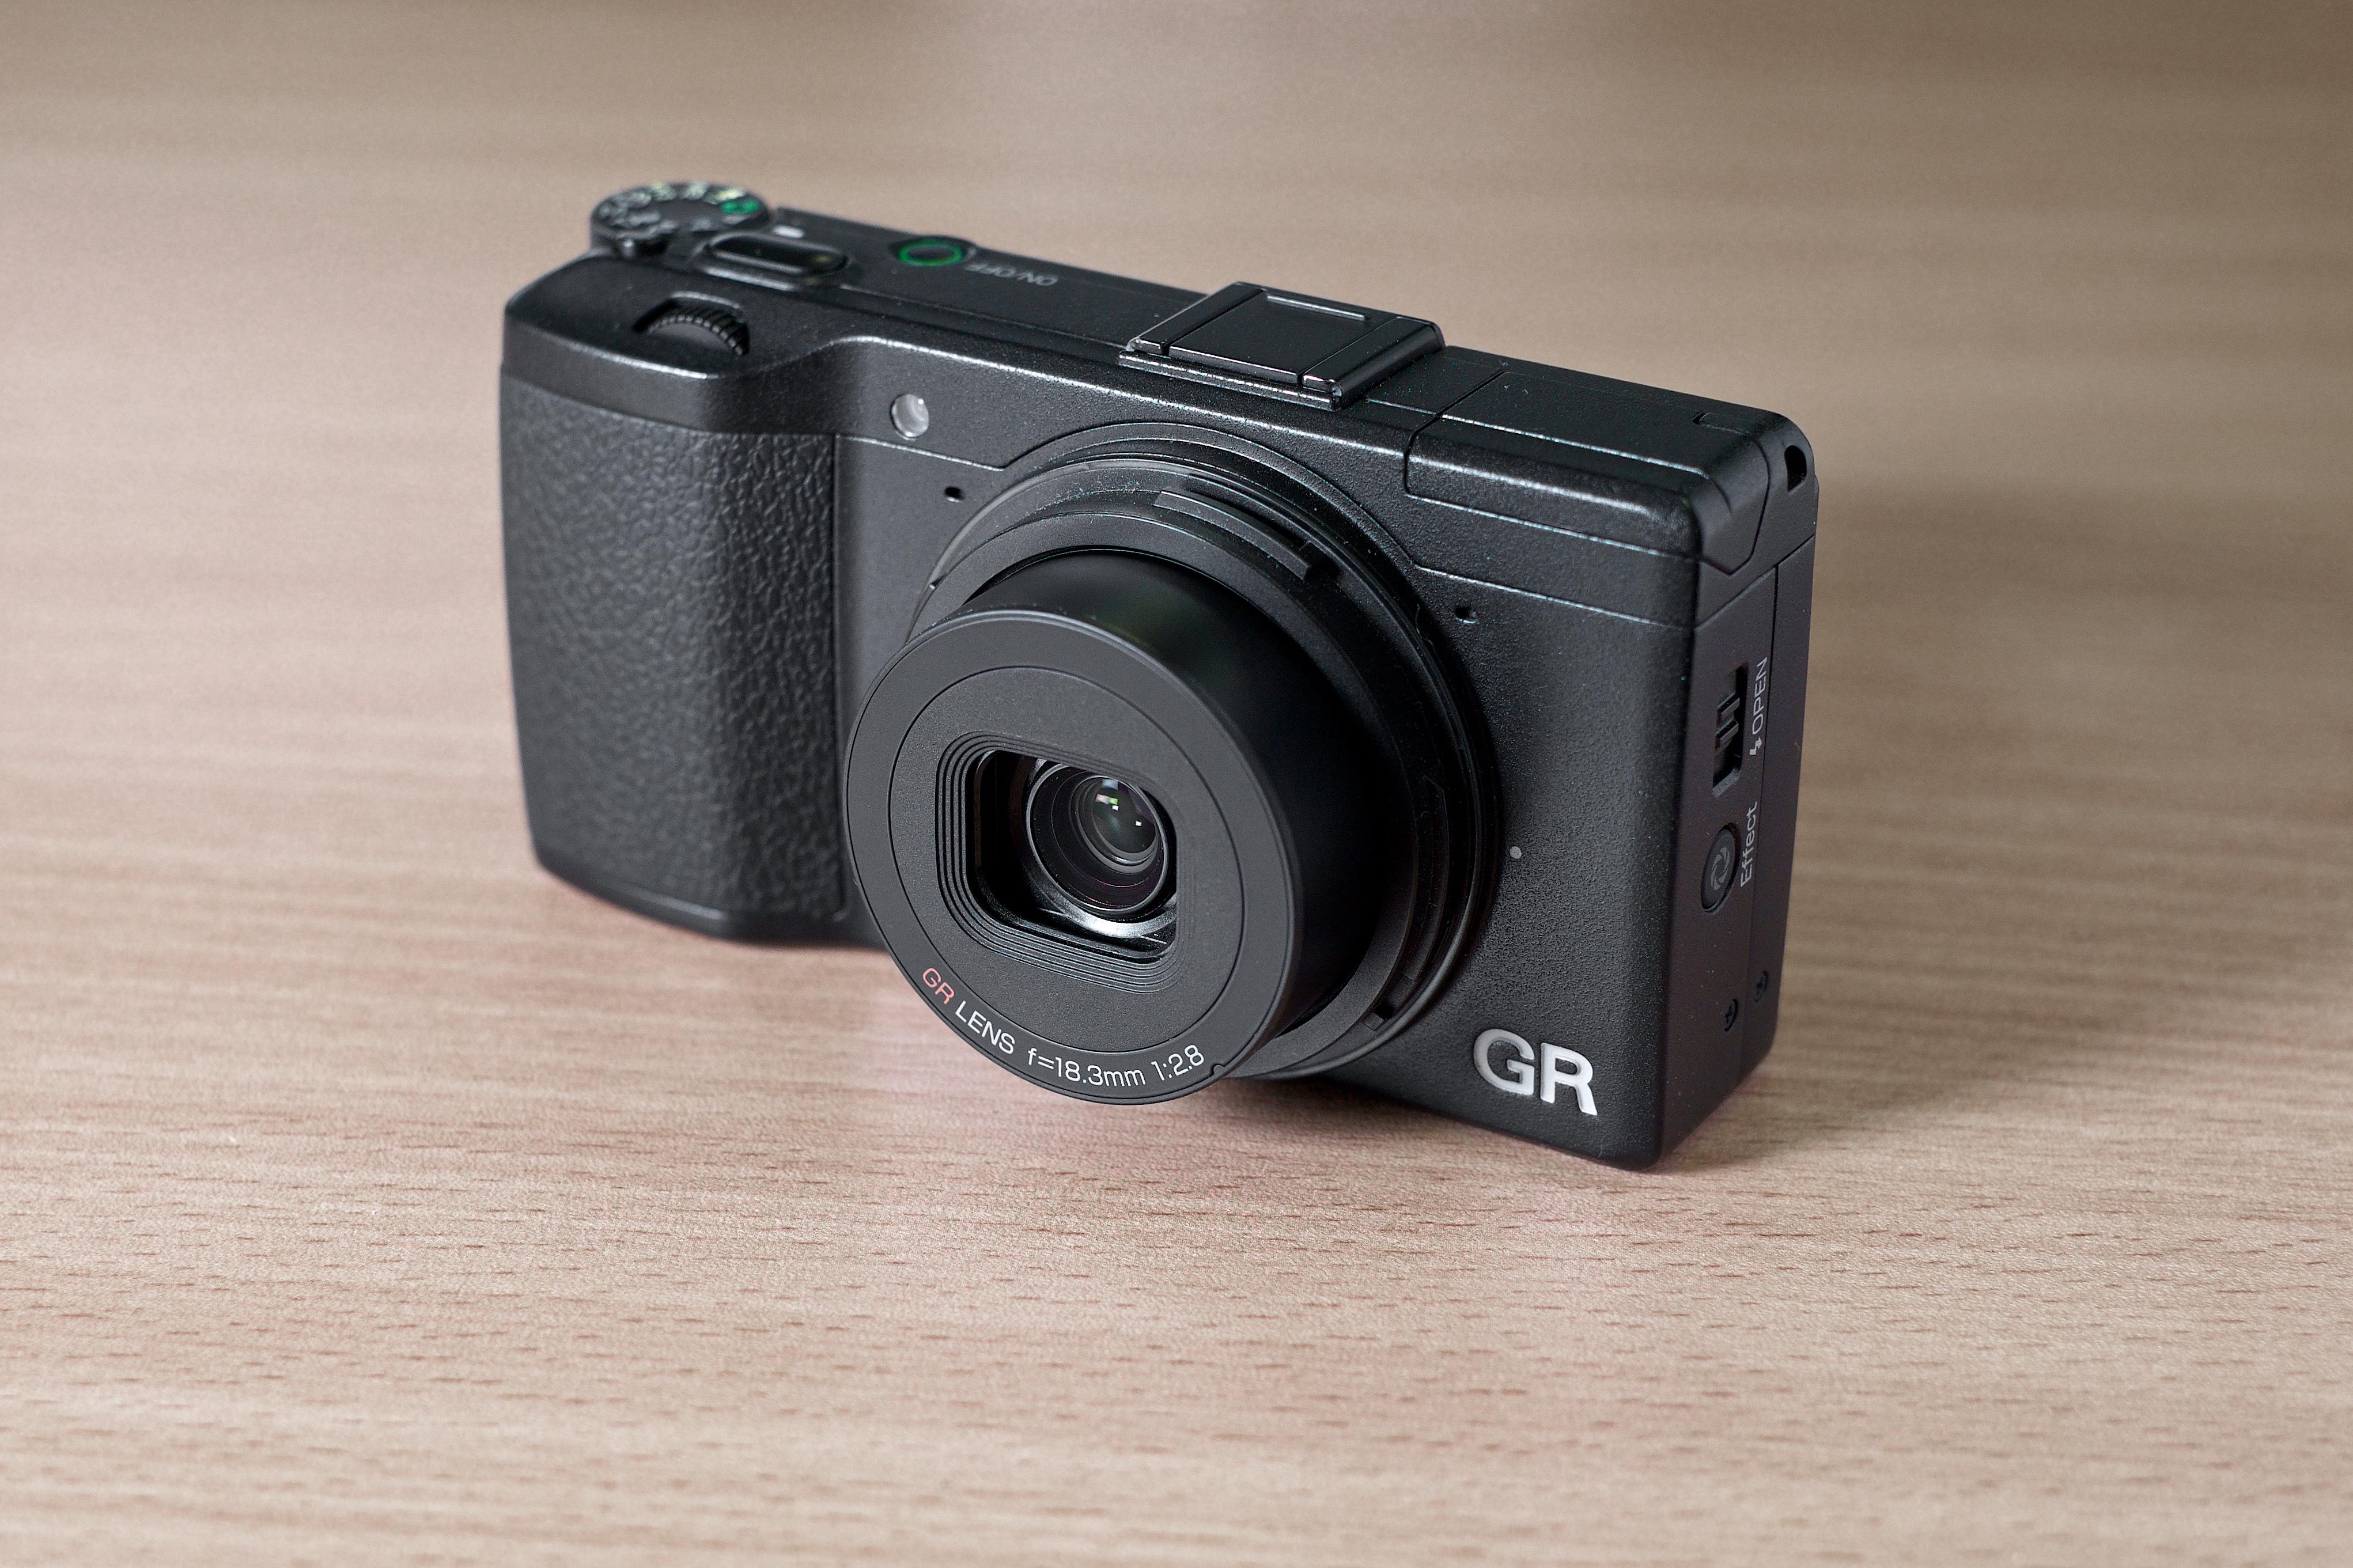 Ricoh GR (large sensor compact camera) - Wikipedia